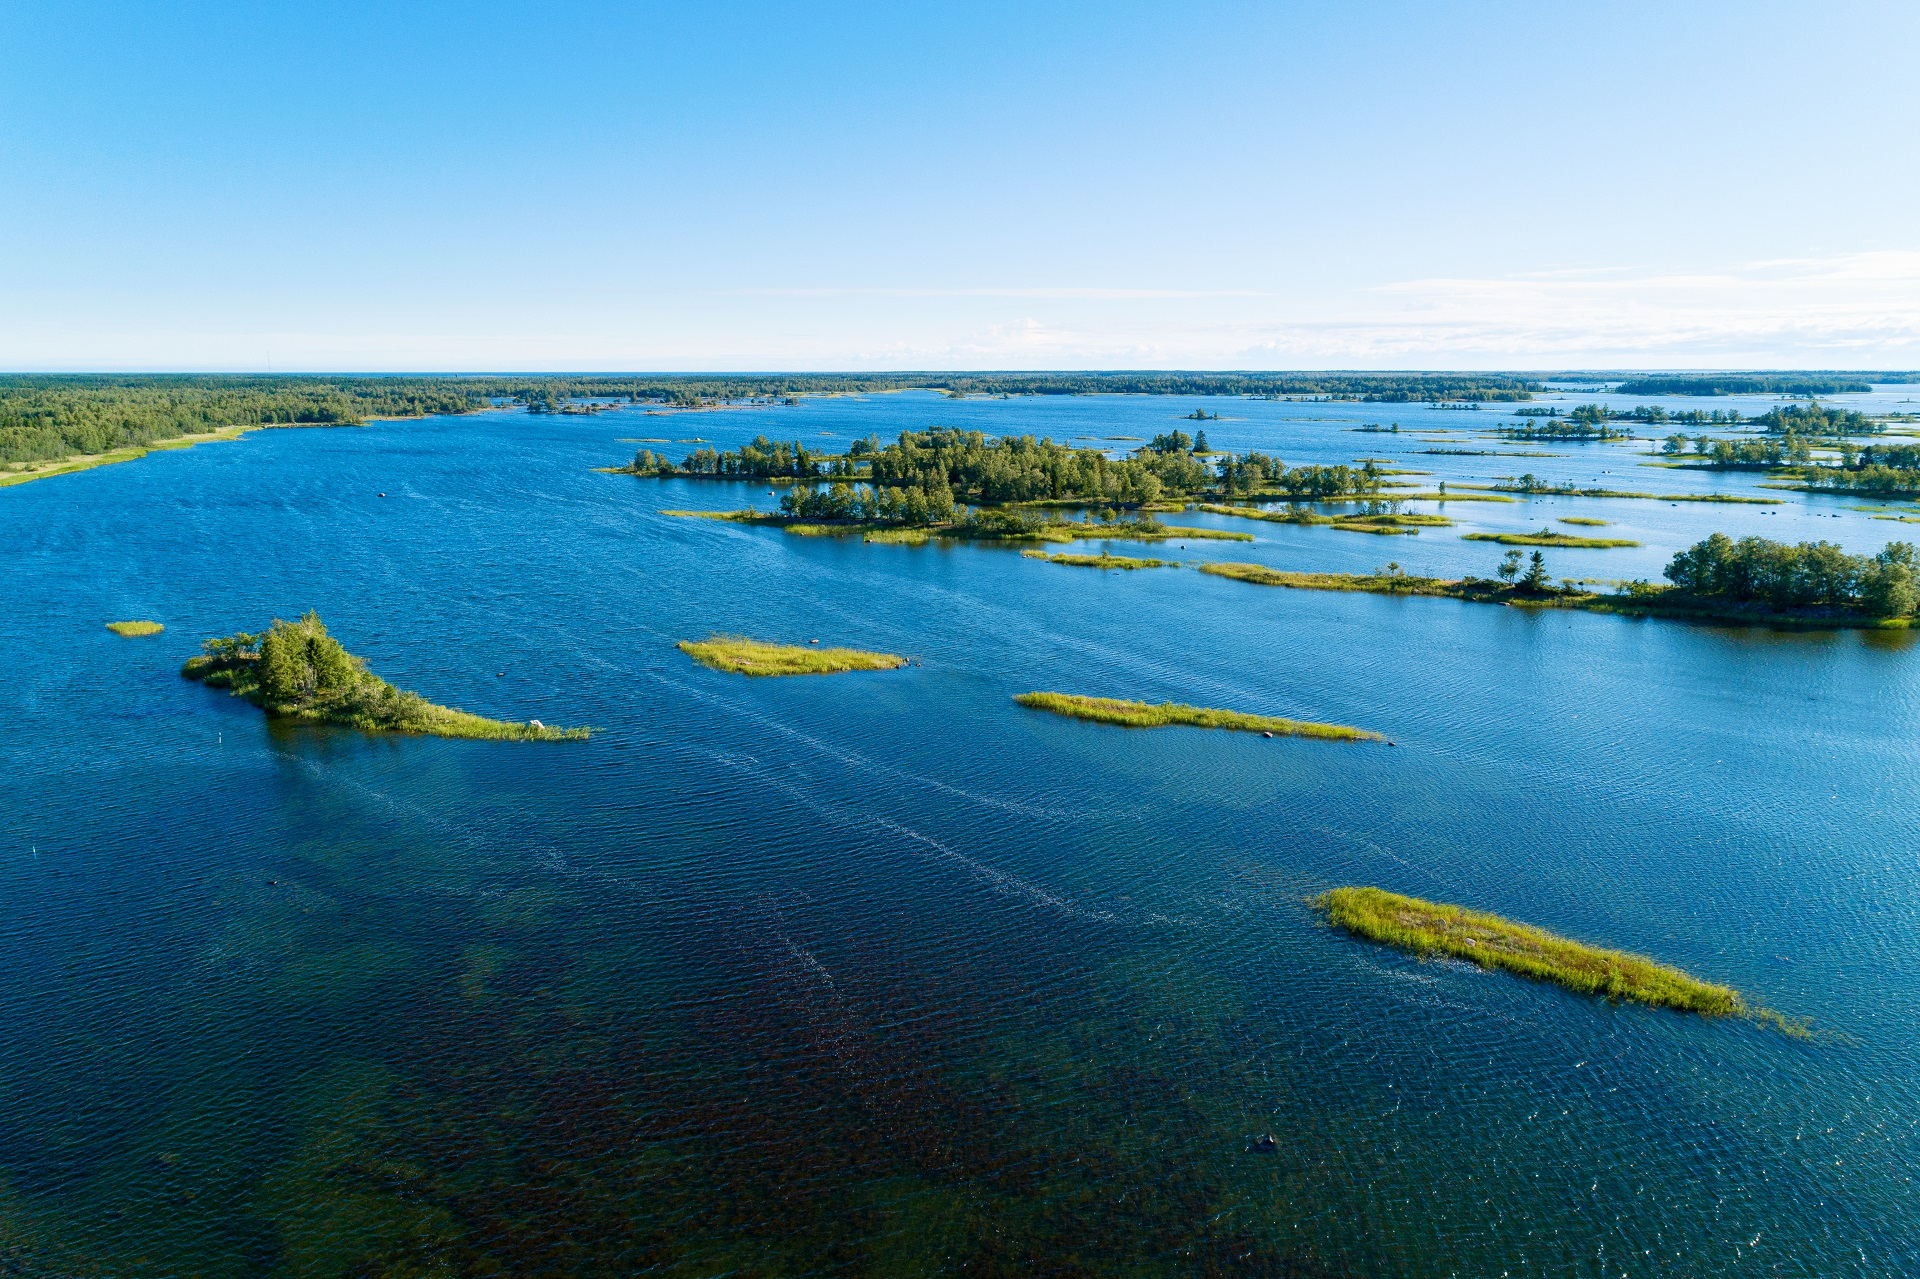 Merenkurkun saaristo on tunnettu De Geer -moreenimaisemastaan.